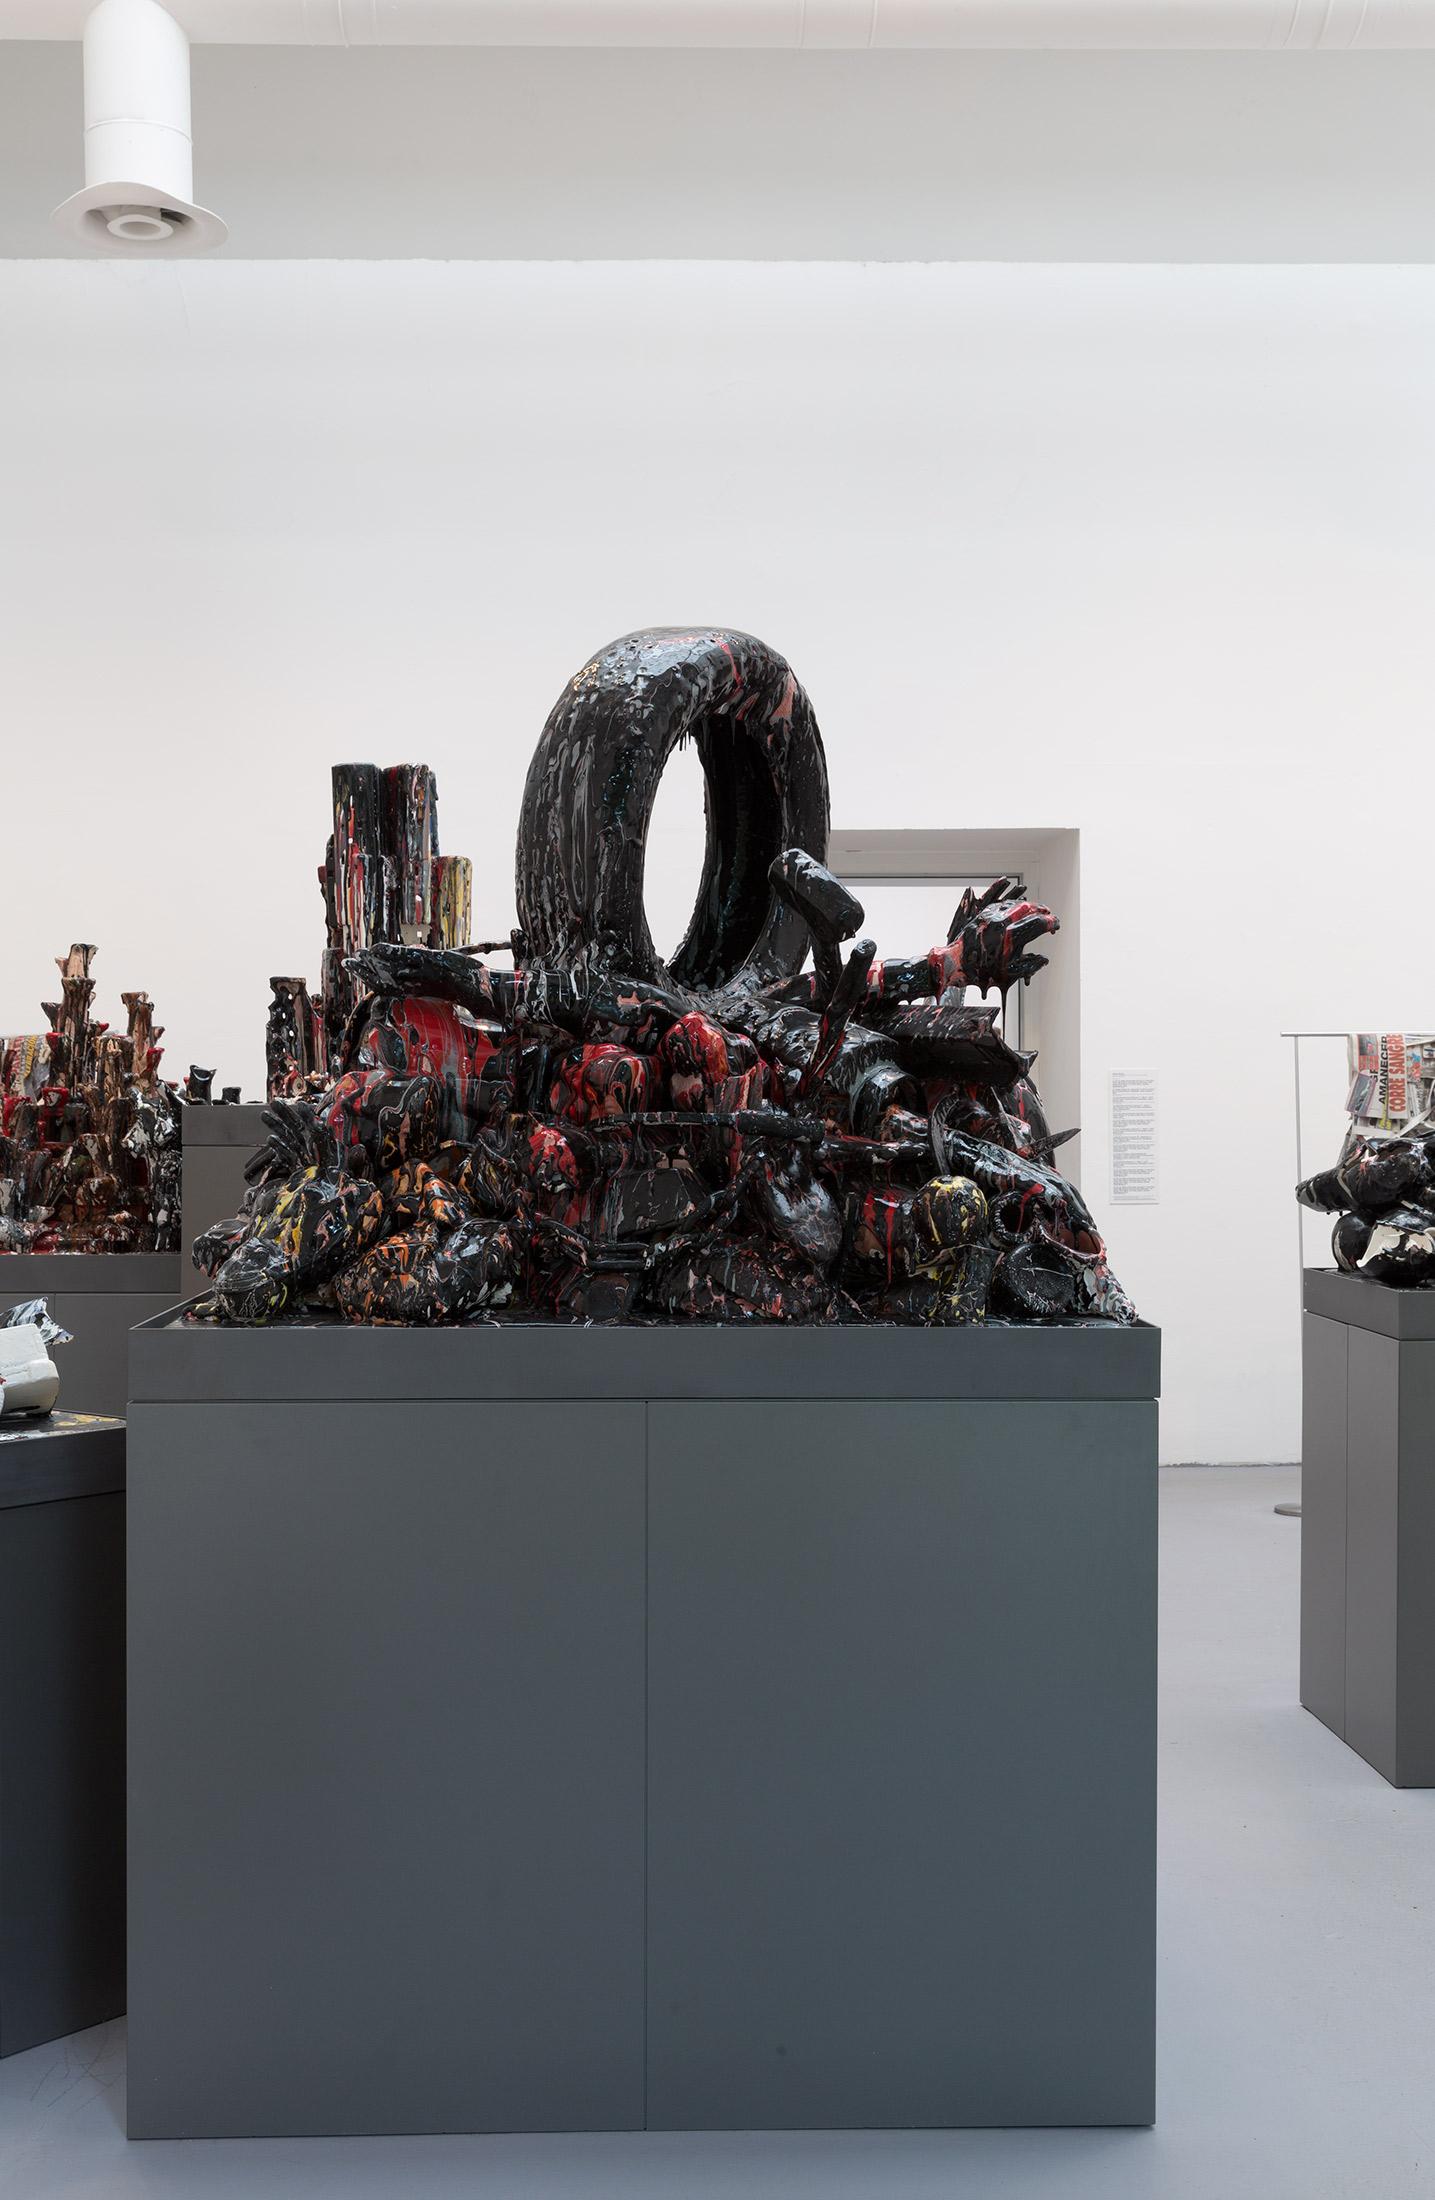 All the World's Futures   Curated by Okwui Enwezor  56th International Art Exhibition  La Biennale di Venezia  Venice  Italy  2015